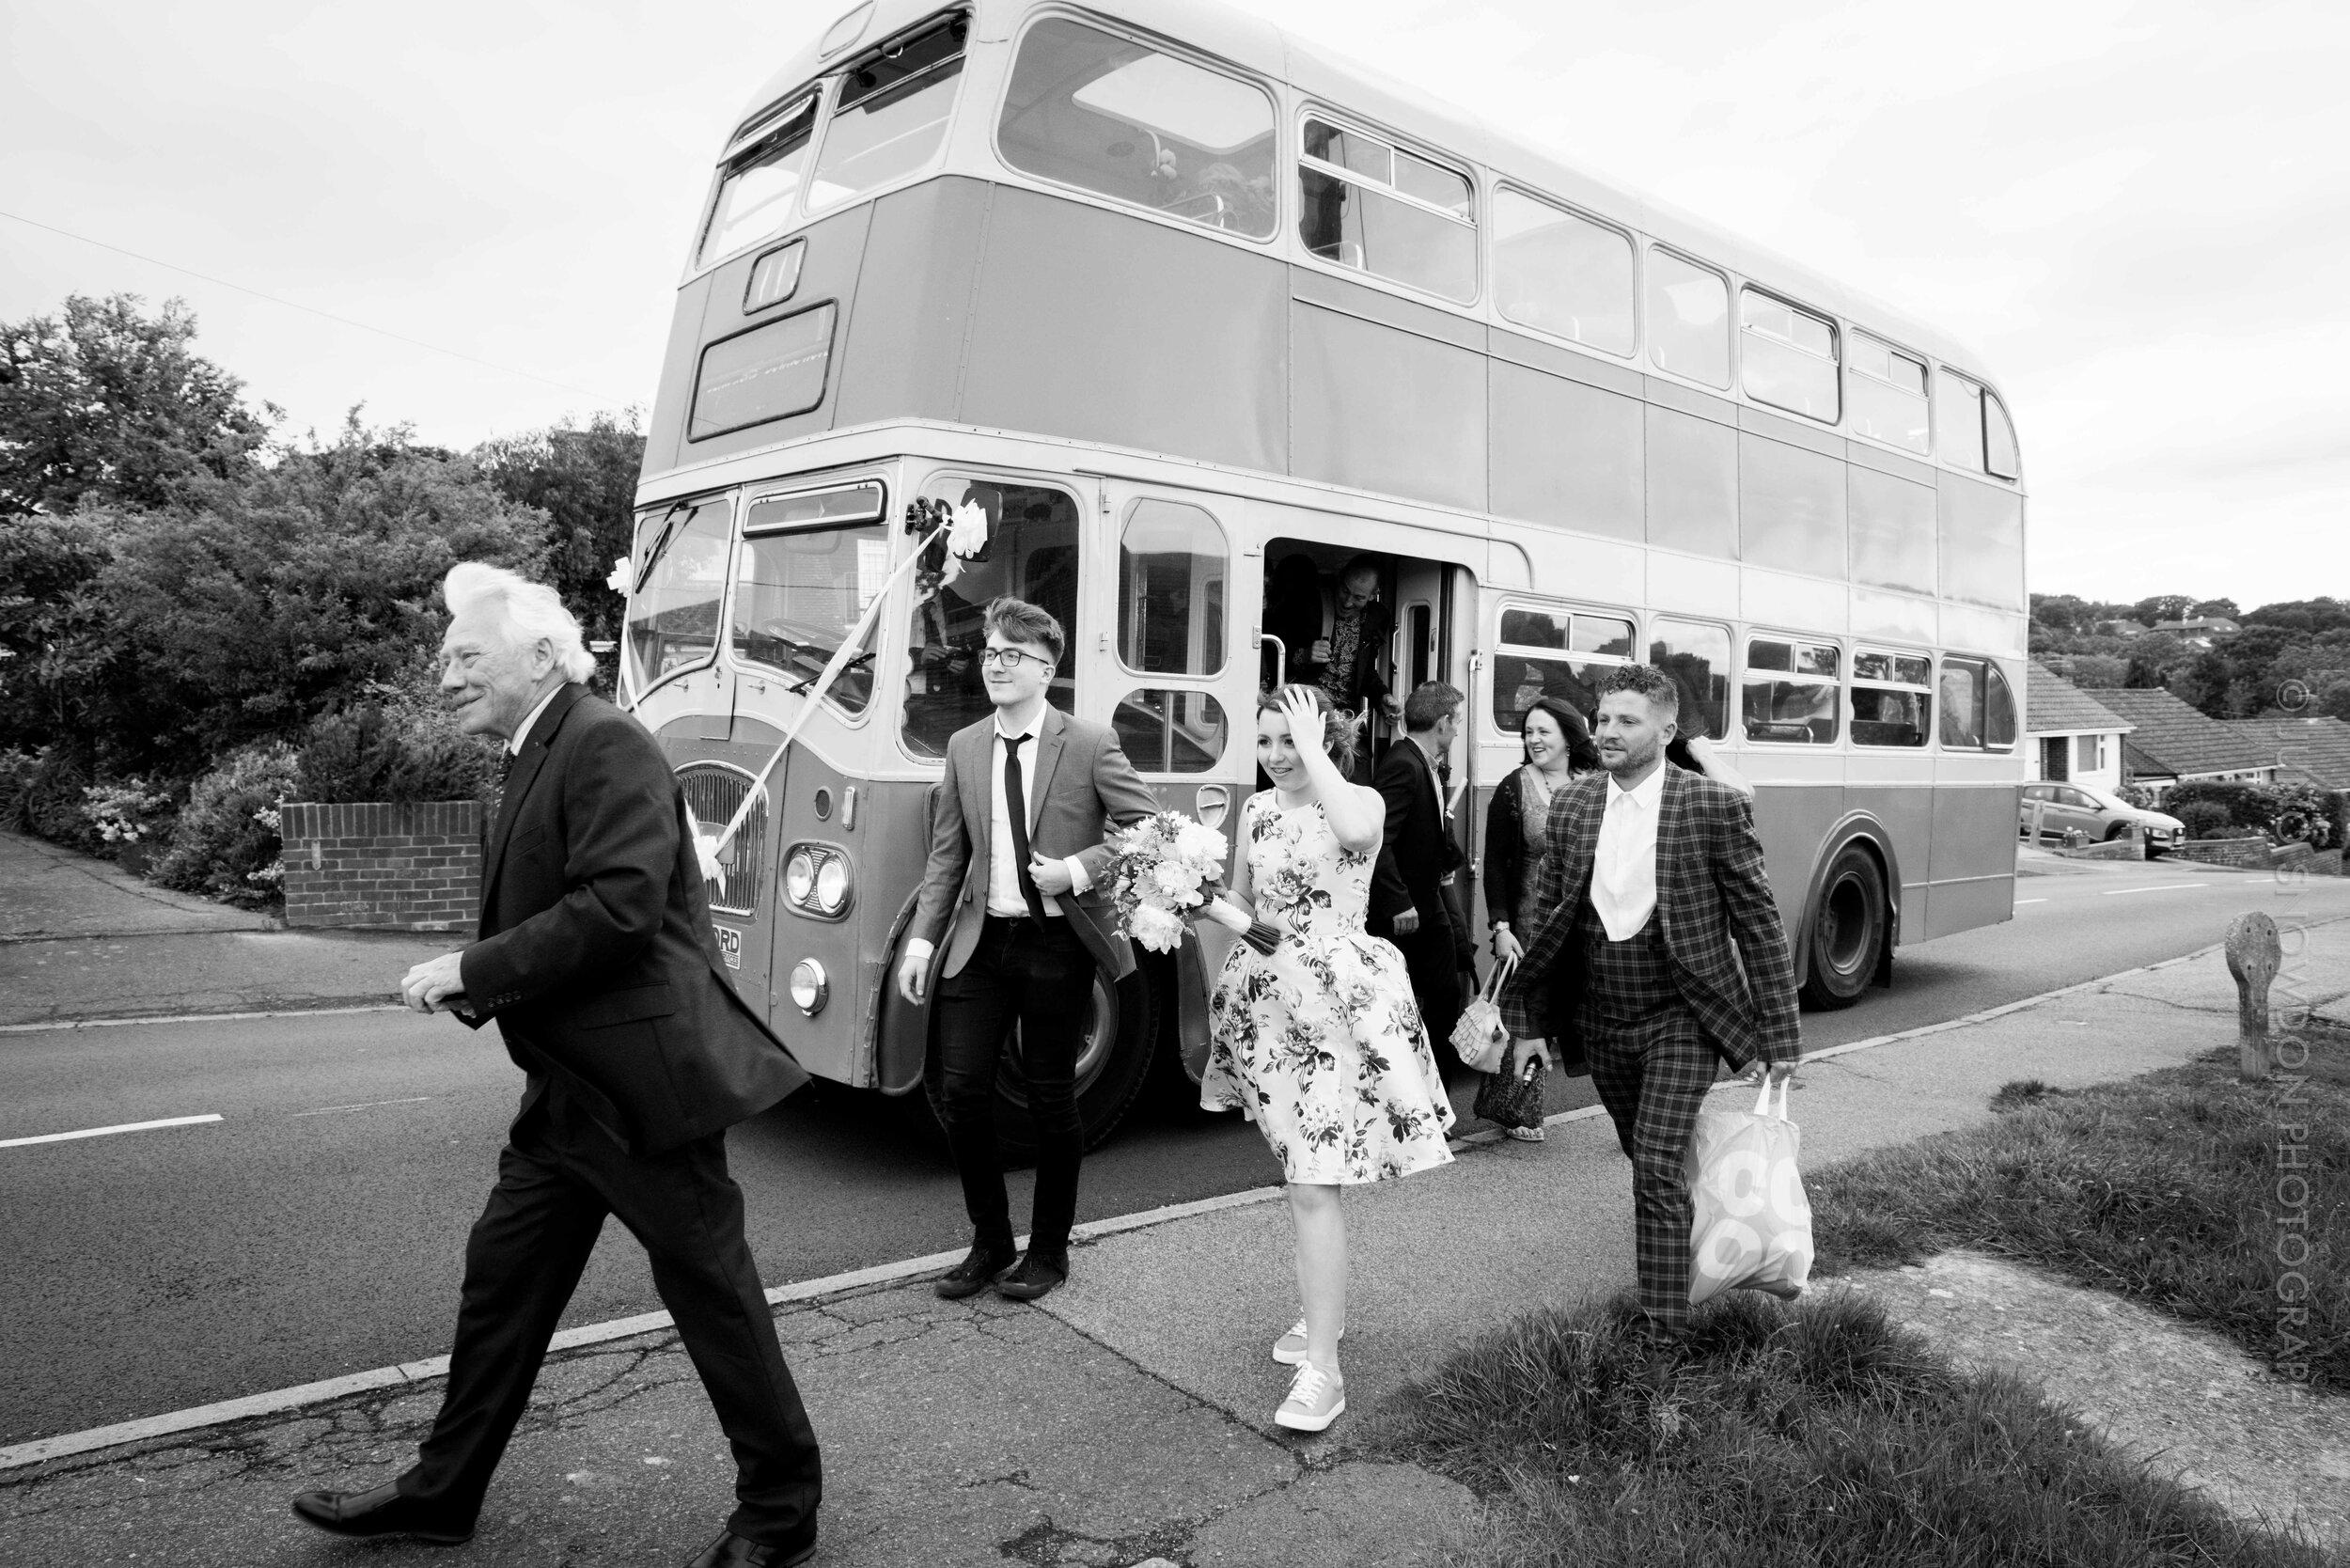 juno-snowdon-photography-wedding-7854.jpg